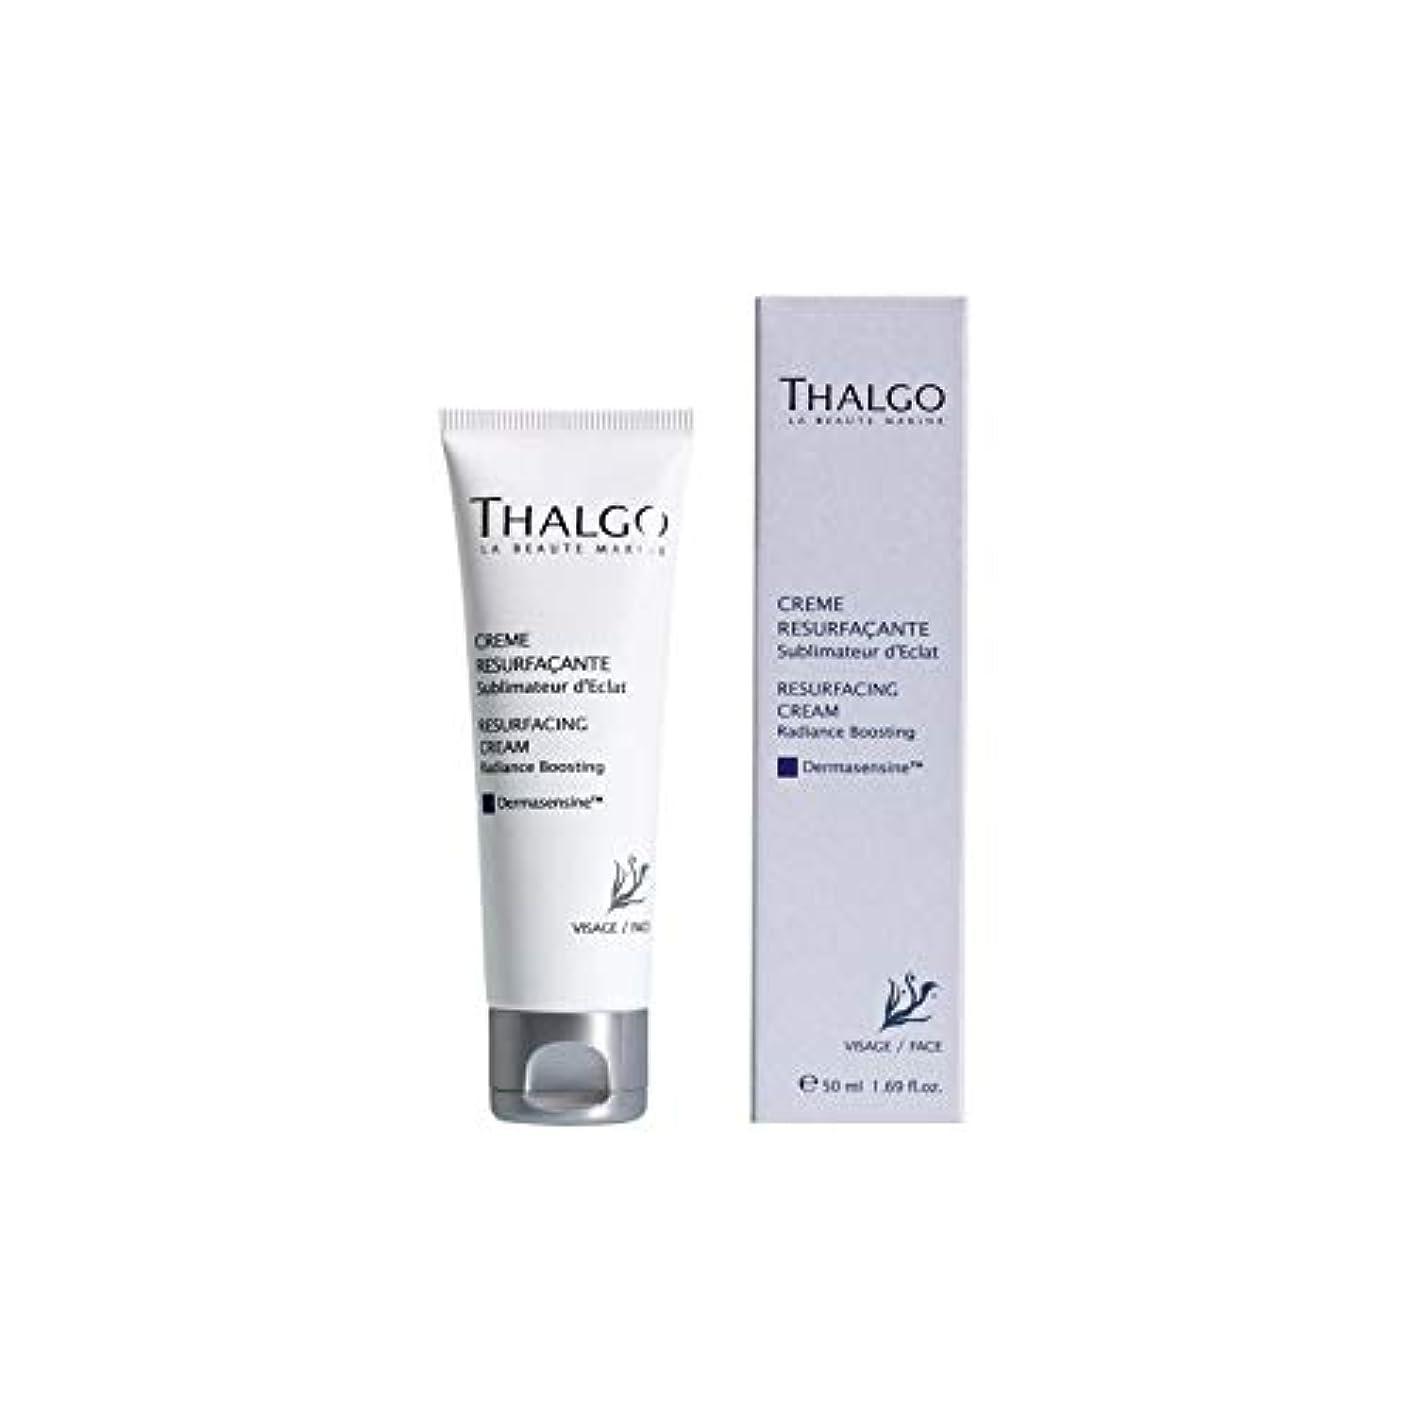 [Thalgo ] タルゴ再舗装クリーム(50ミリリットル) - Thalgo Resurfacing Cream (50ml) [並行輸入品]